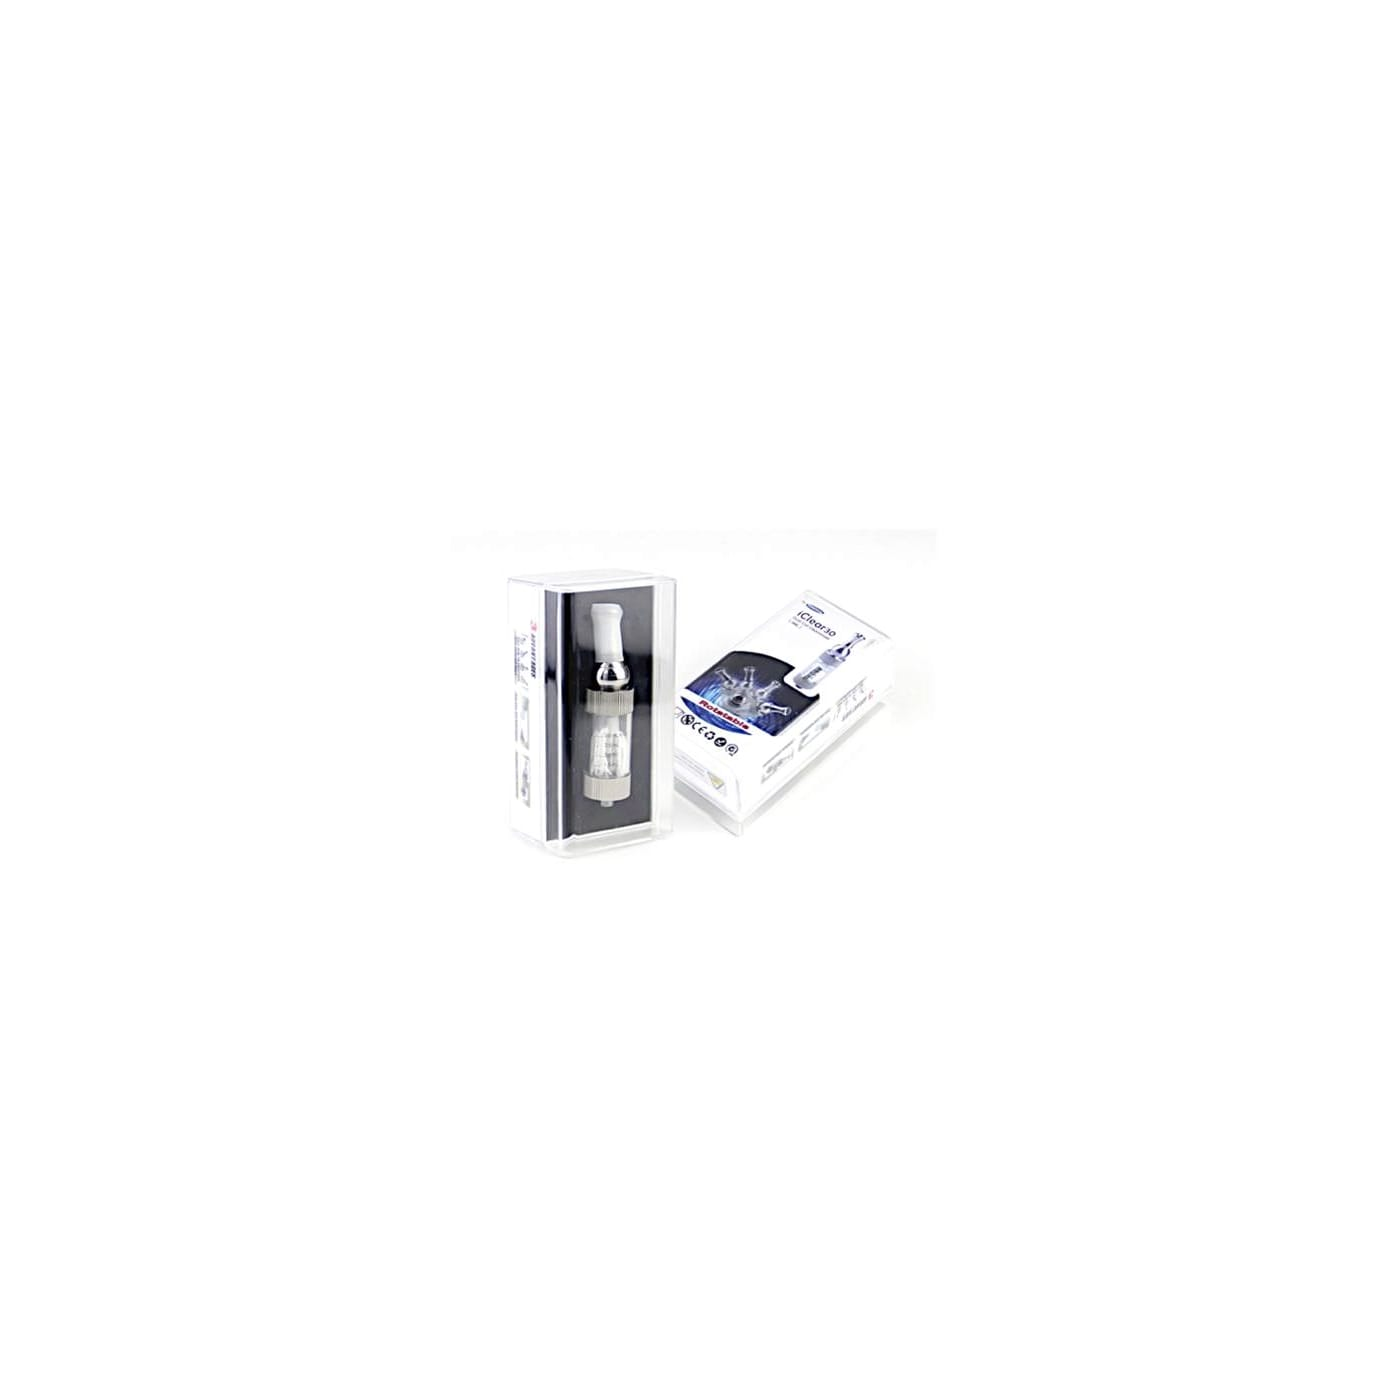 Innokin iClear 30 Dual Coil Clearomizer 3 mL - Clear